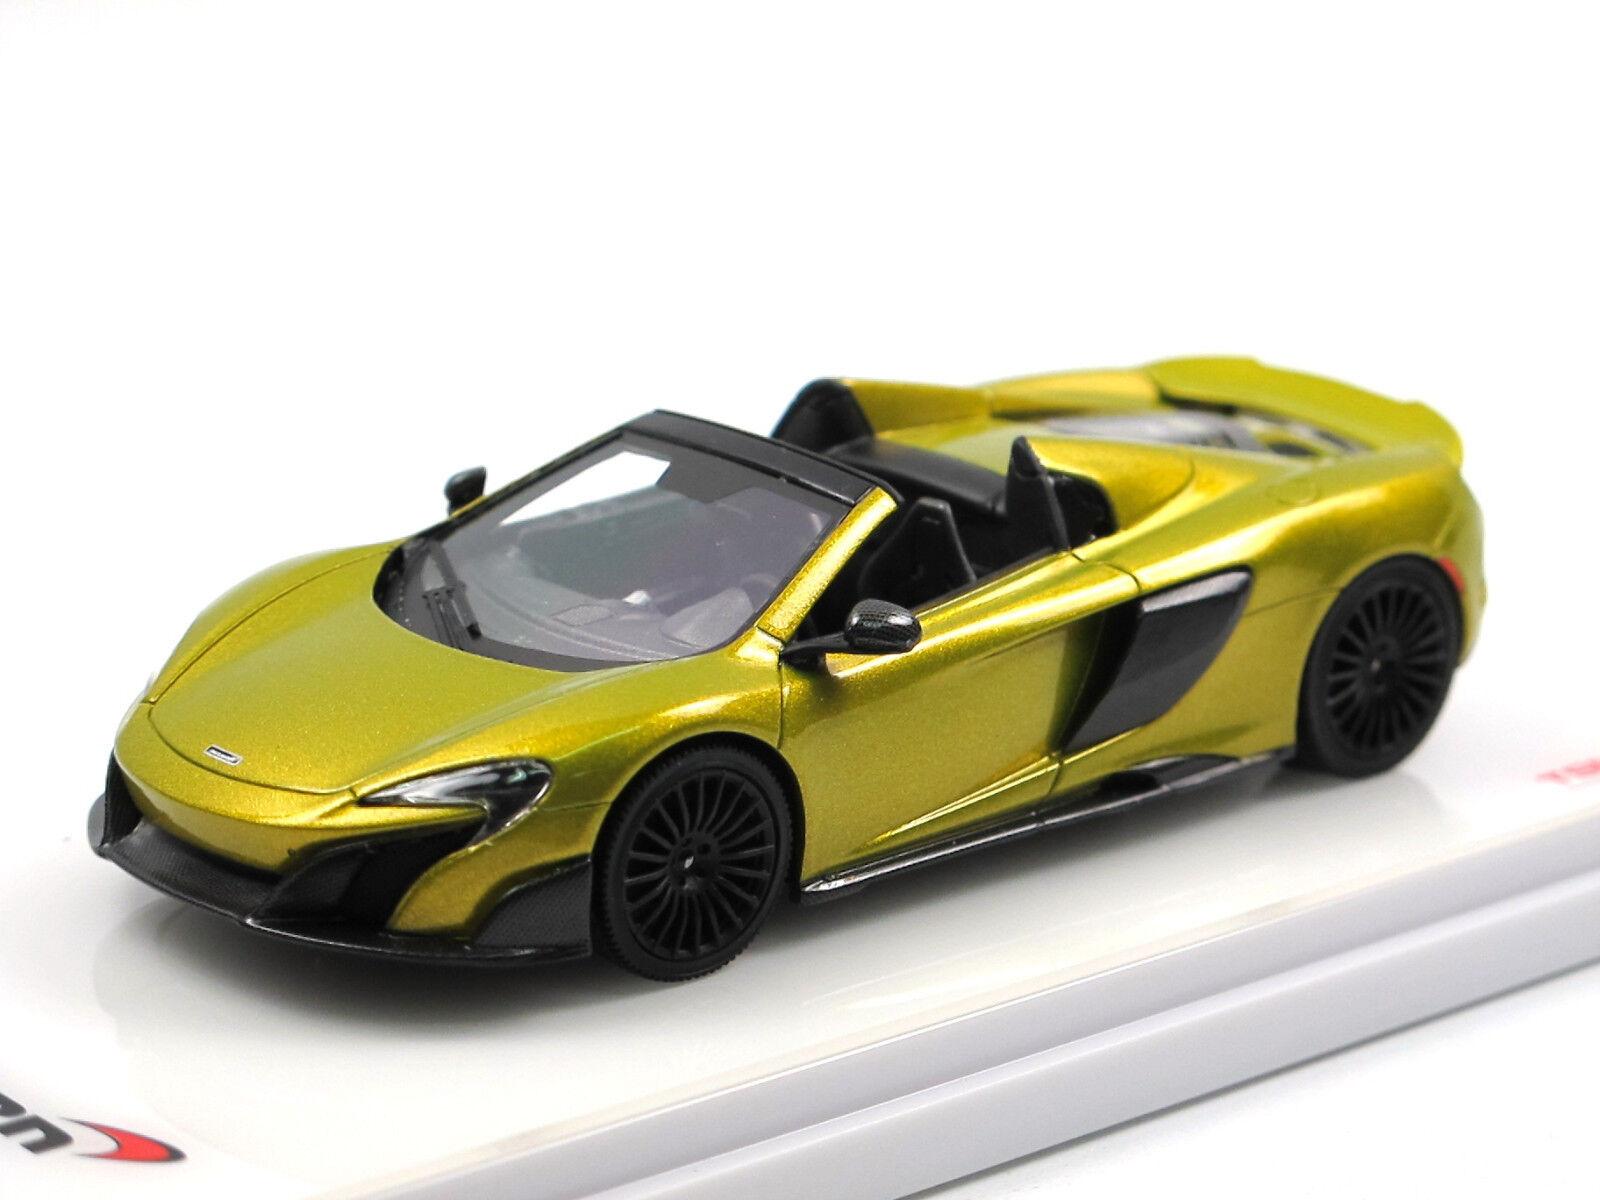 TSM Model TSM430202 - 2015 McLaren 675LT Spider Solis Yellow - 1 43 Resin